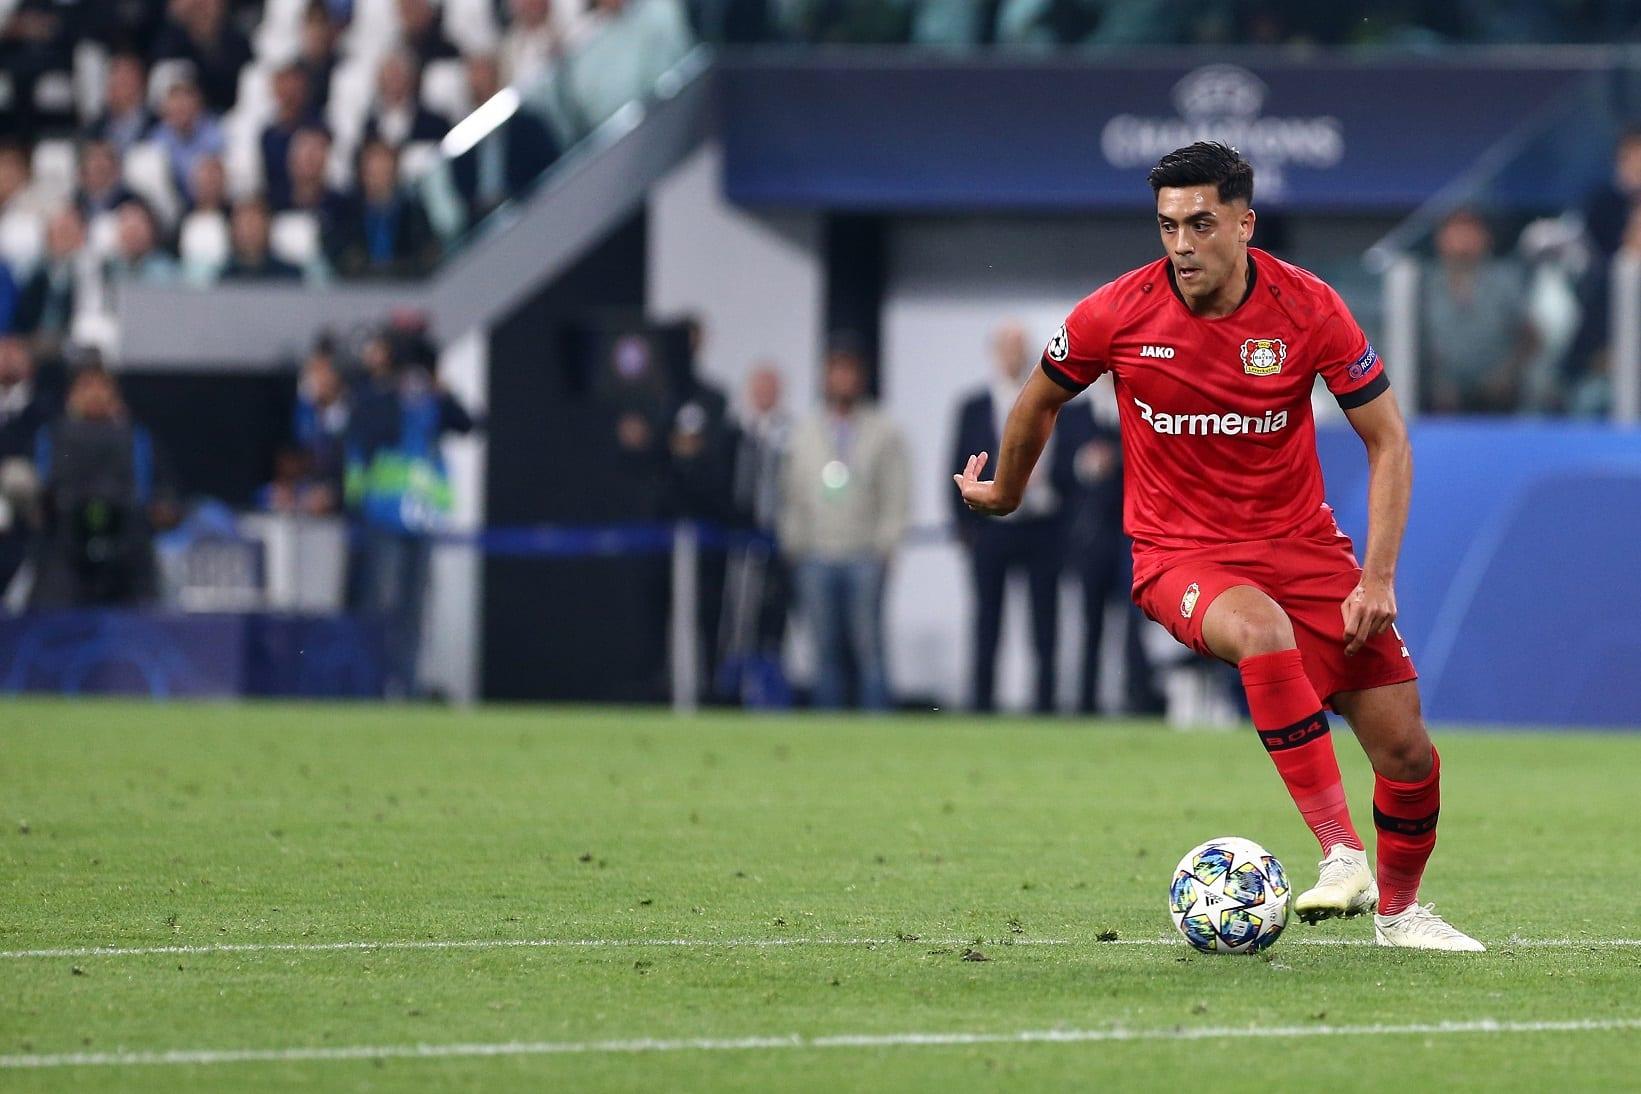 Bayer Leverkusen piłkarz Amiri